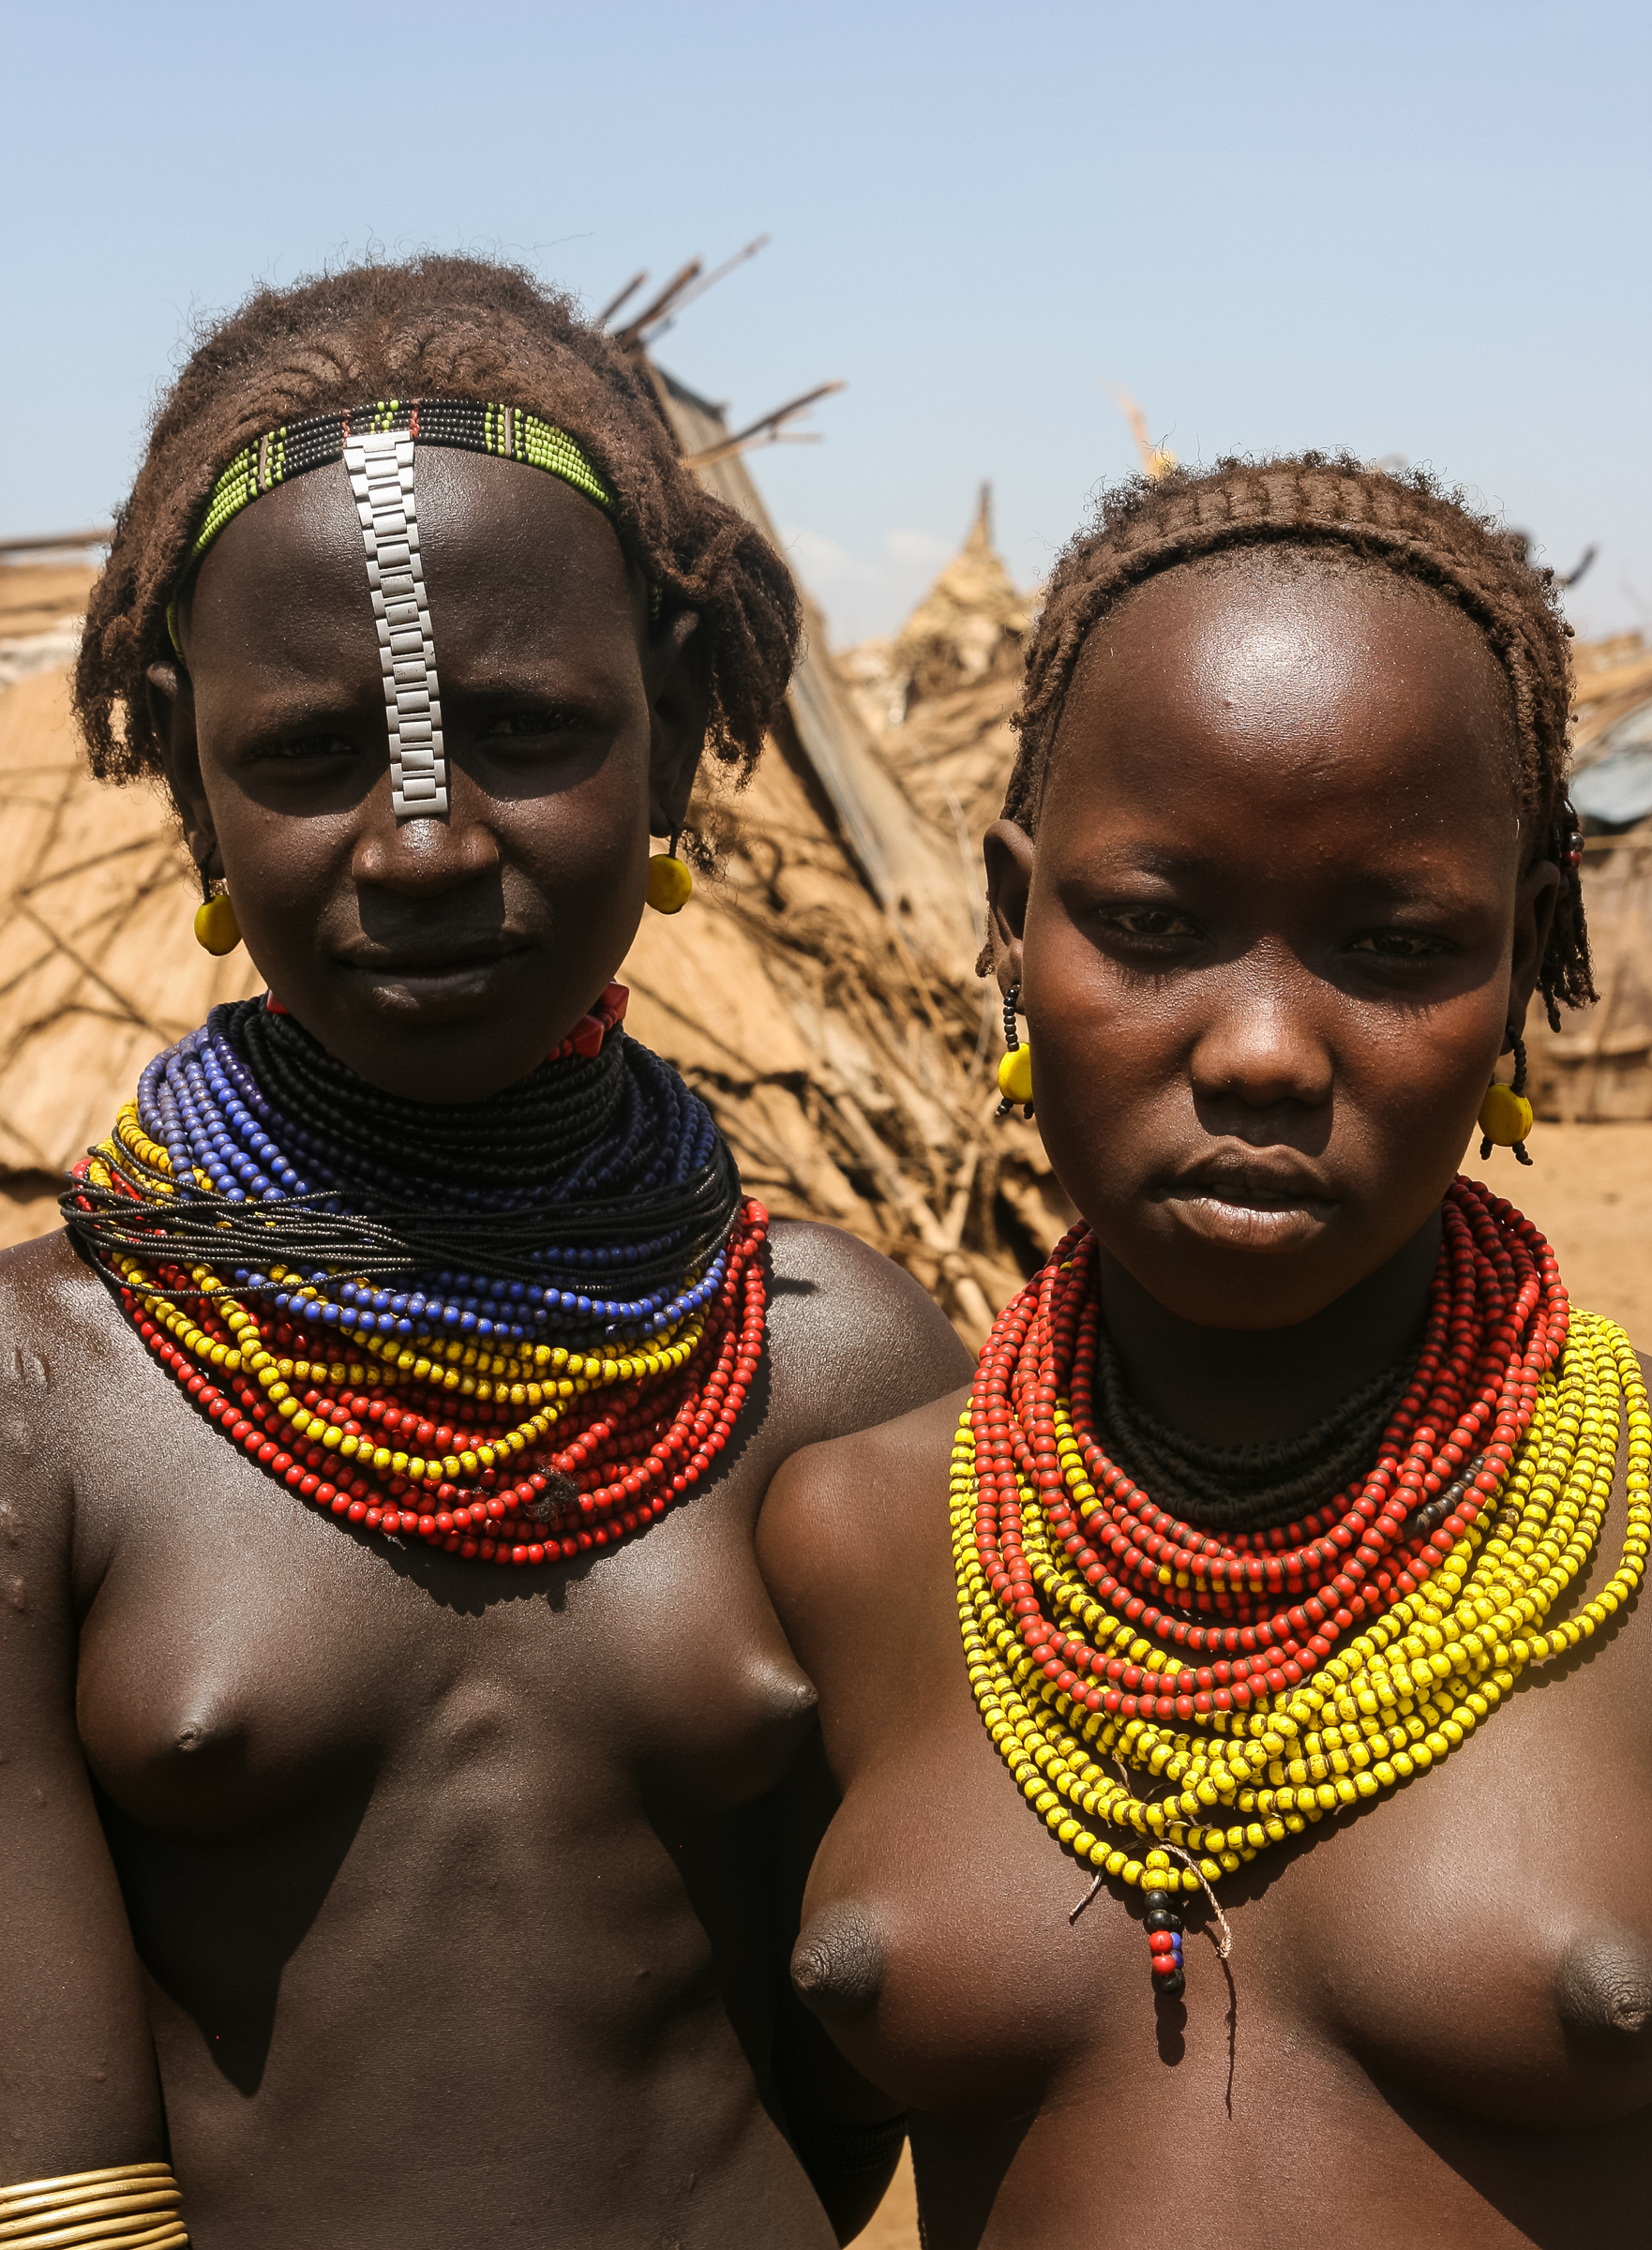 Ethiopia pics (8).jpg